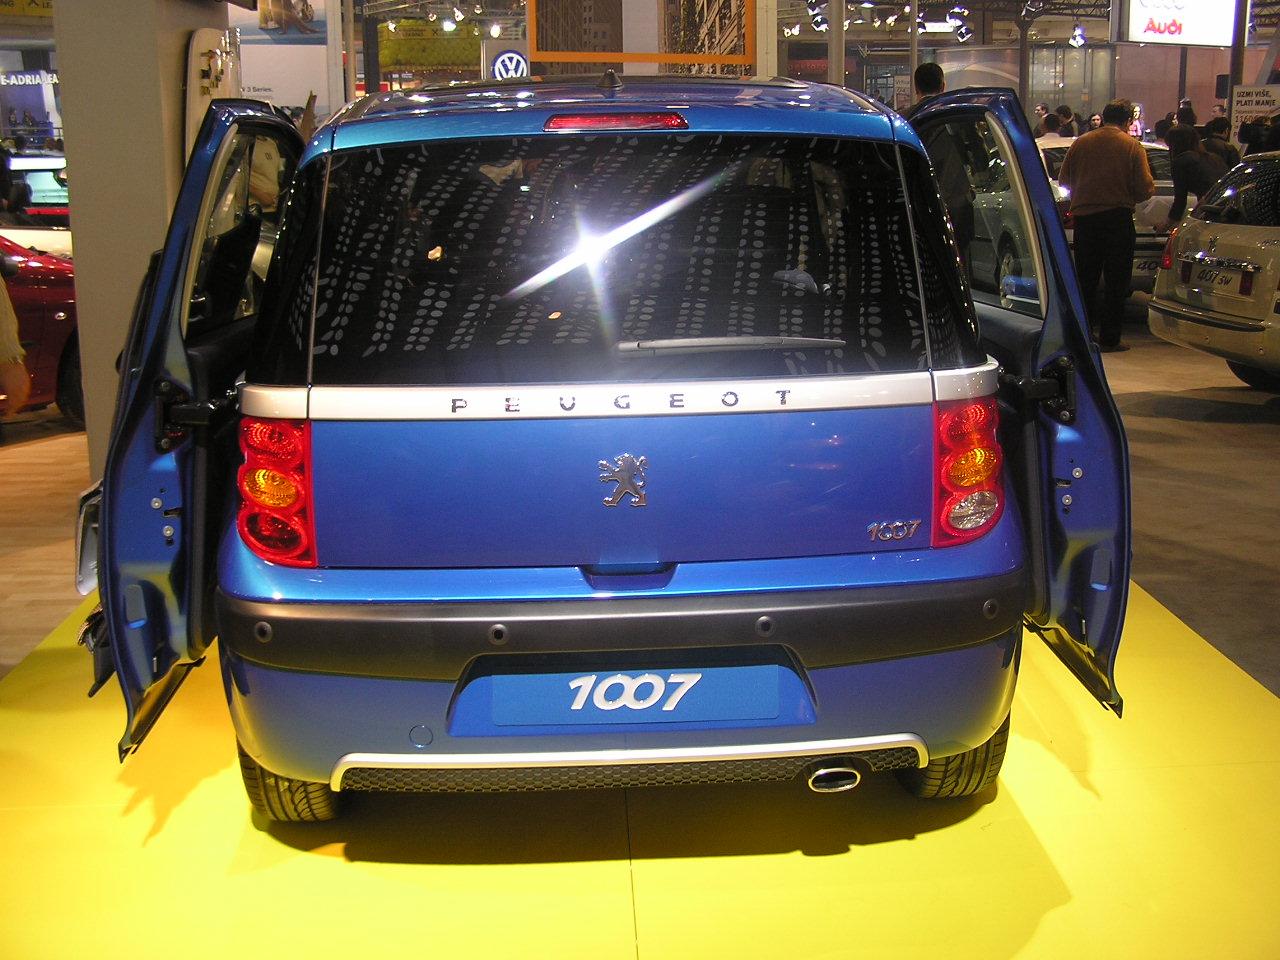 El juego de las imagenes-http://upload.wikimedia.org/wikipedia/commons/f/f1/Peugeot_1007_back.jpeg